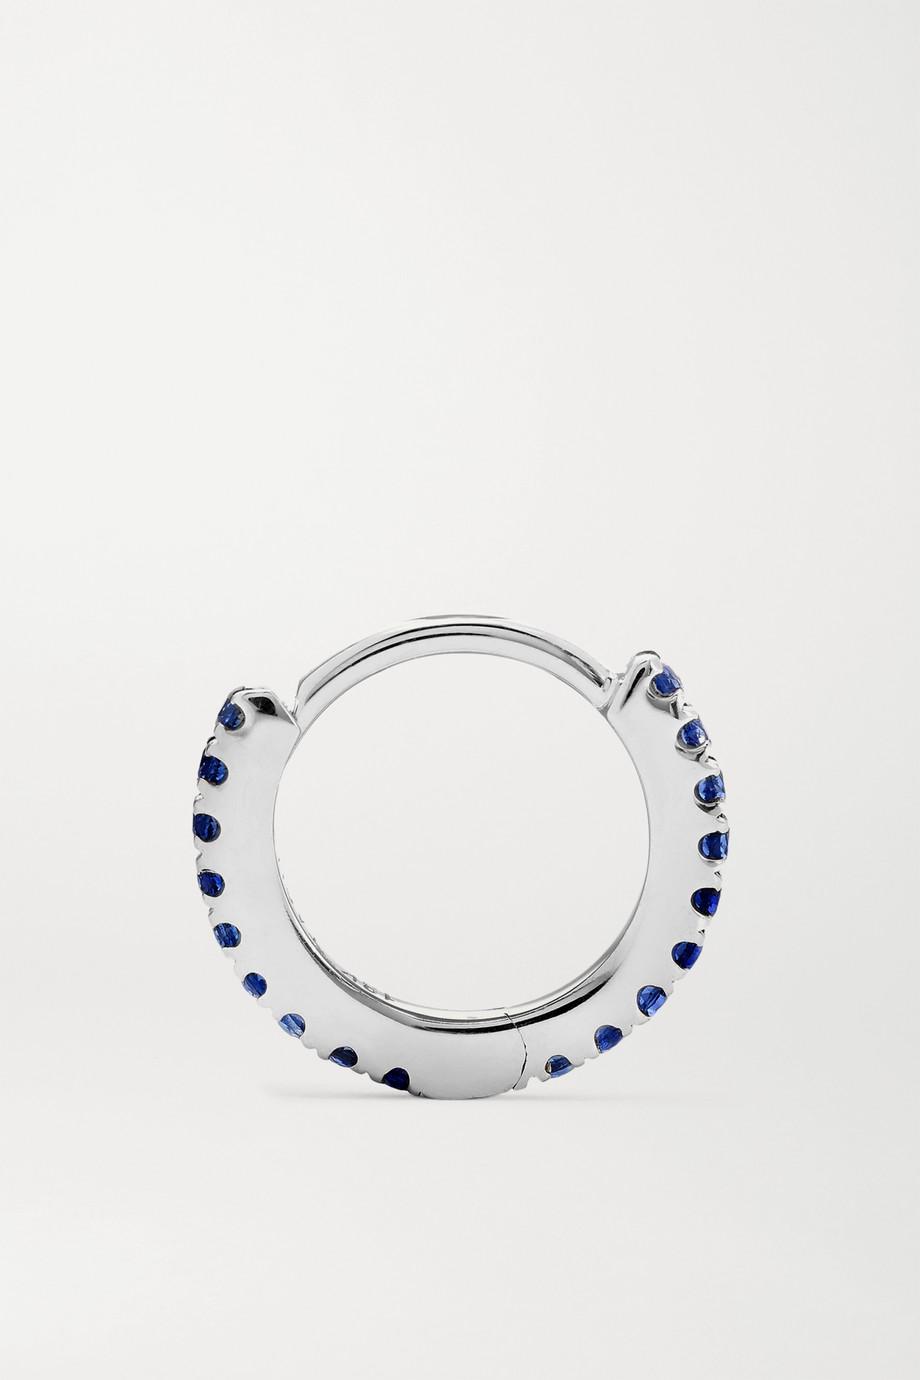 Maria Tash 6.5mm 14-karat white gold sapphire hoop earring